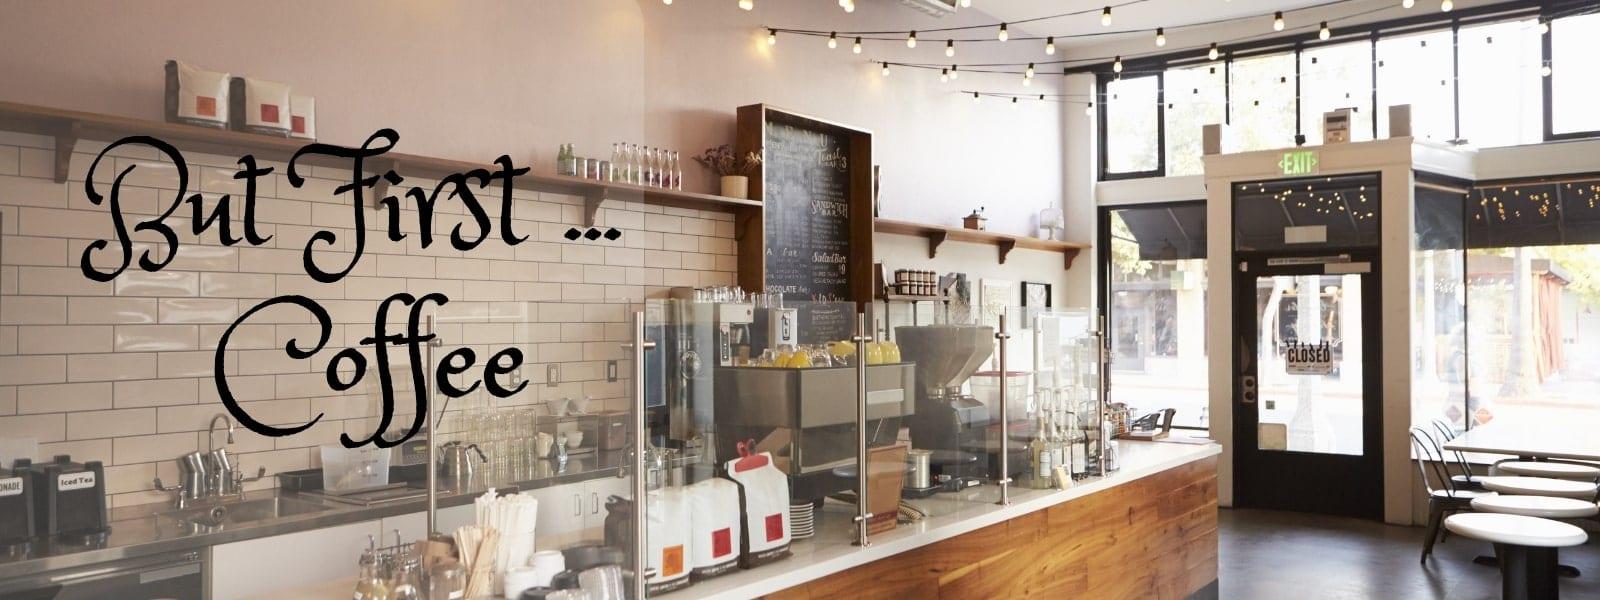 Sarasota Coffee Shops near Blvd Sarasota